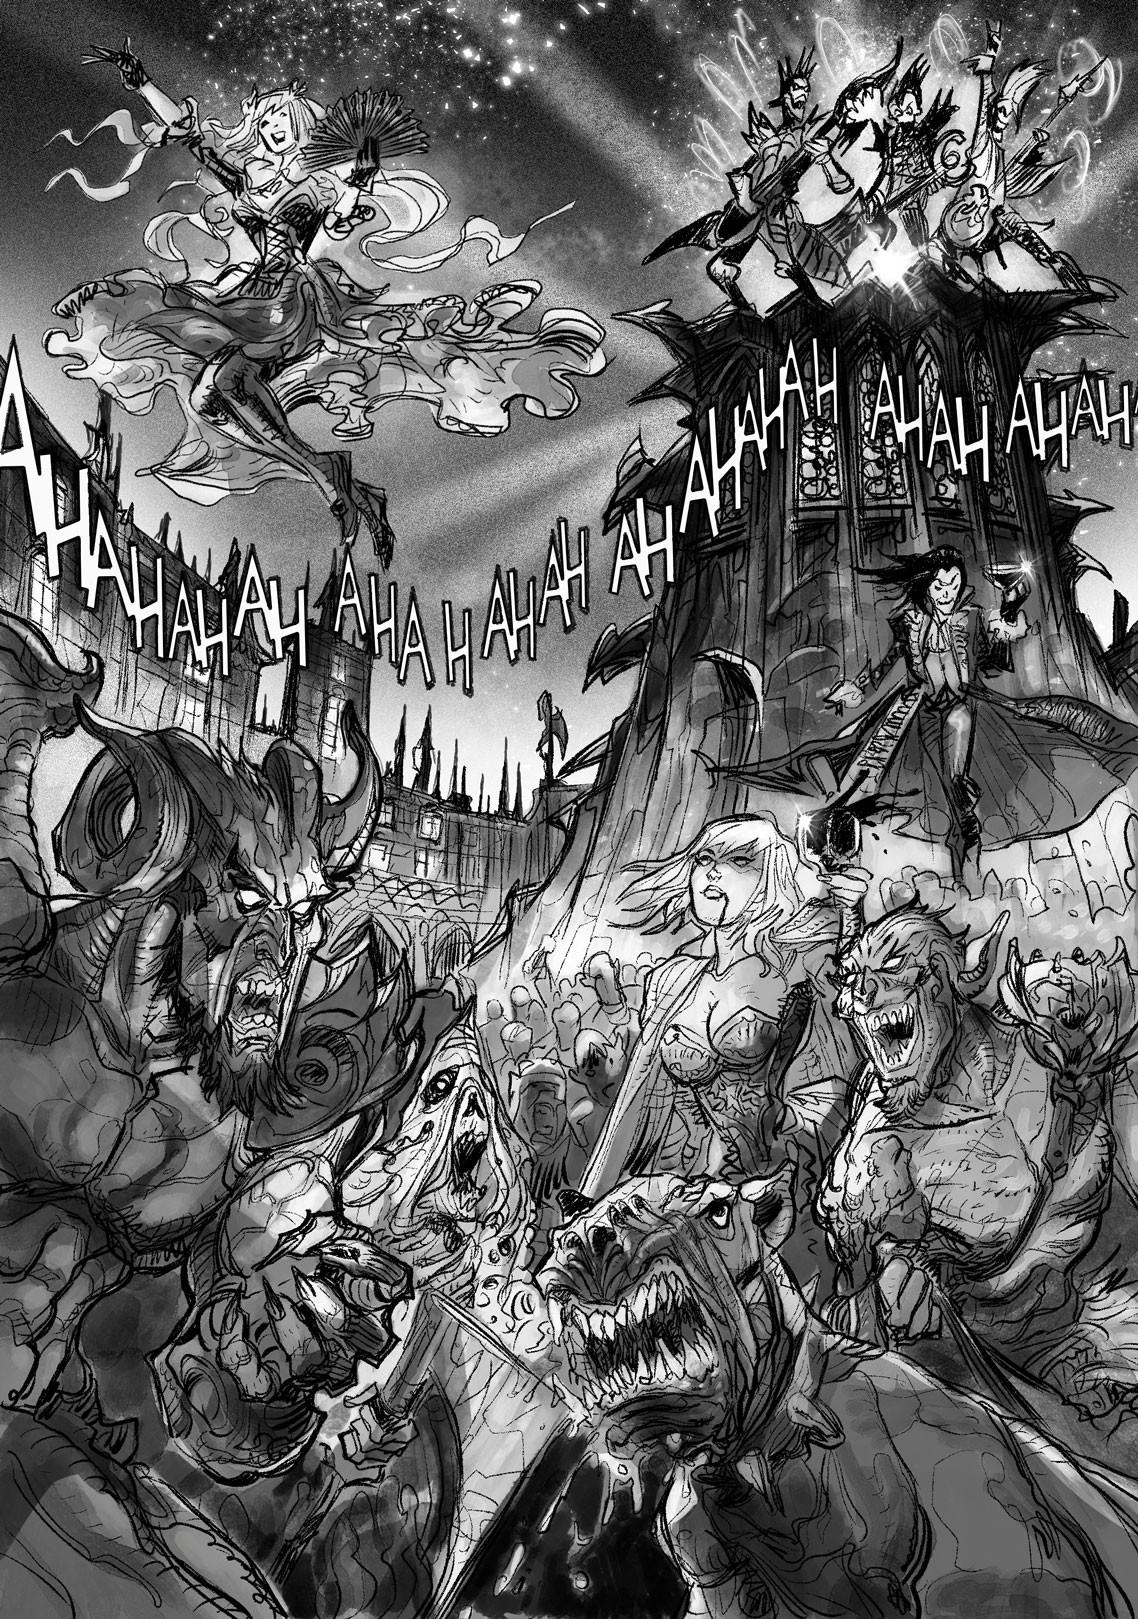 Daniele afferni 012 niflheim page 01